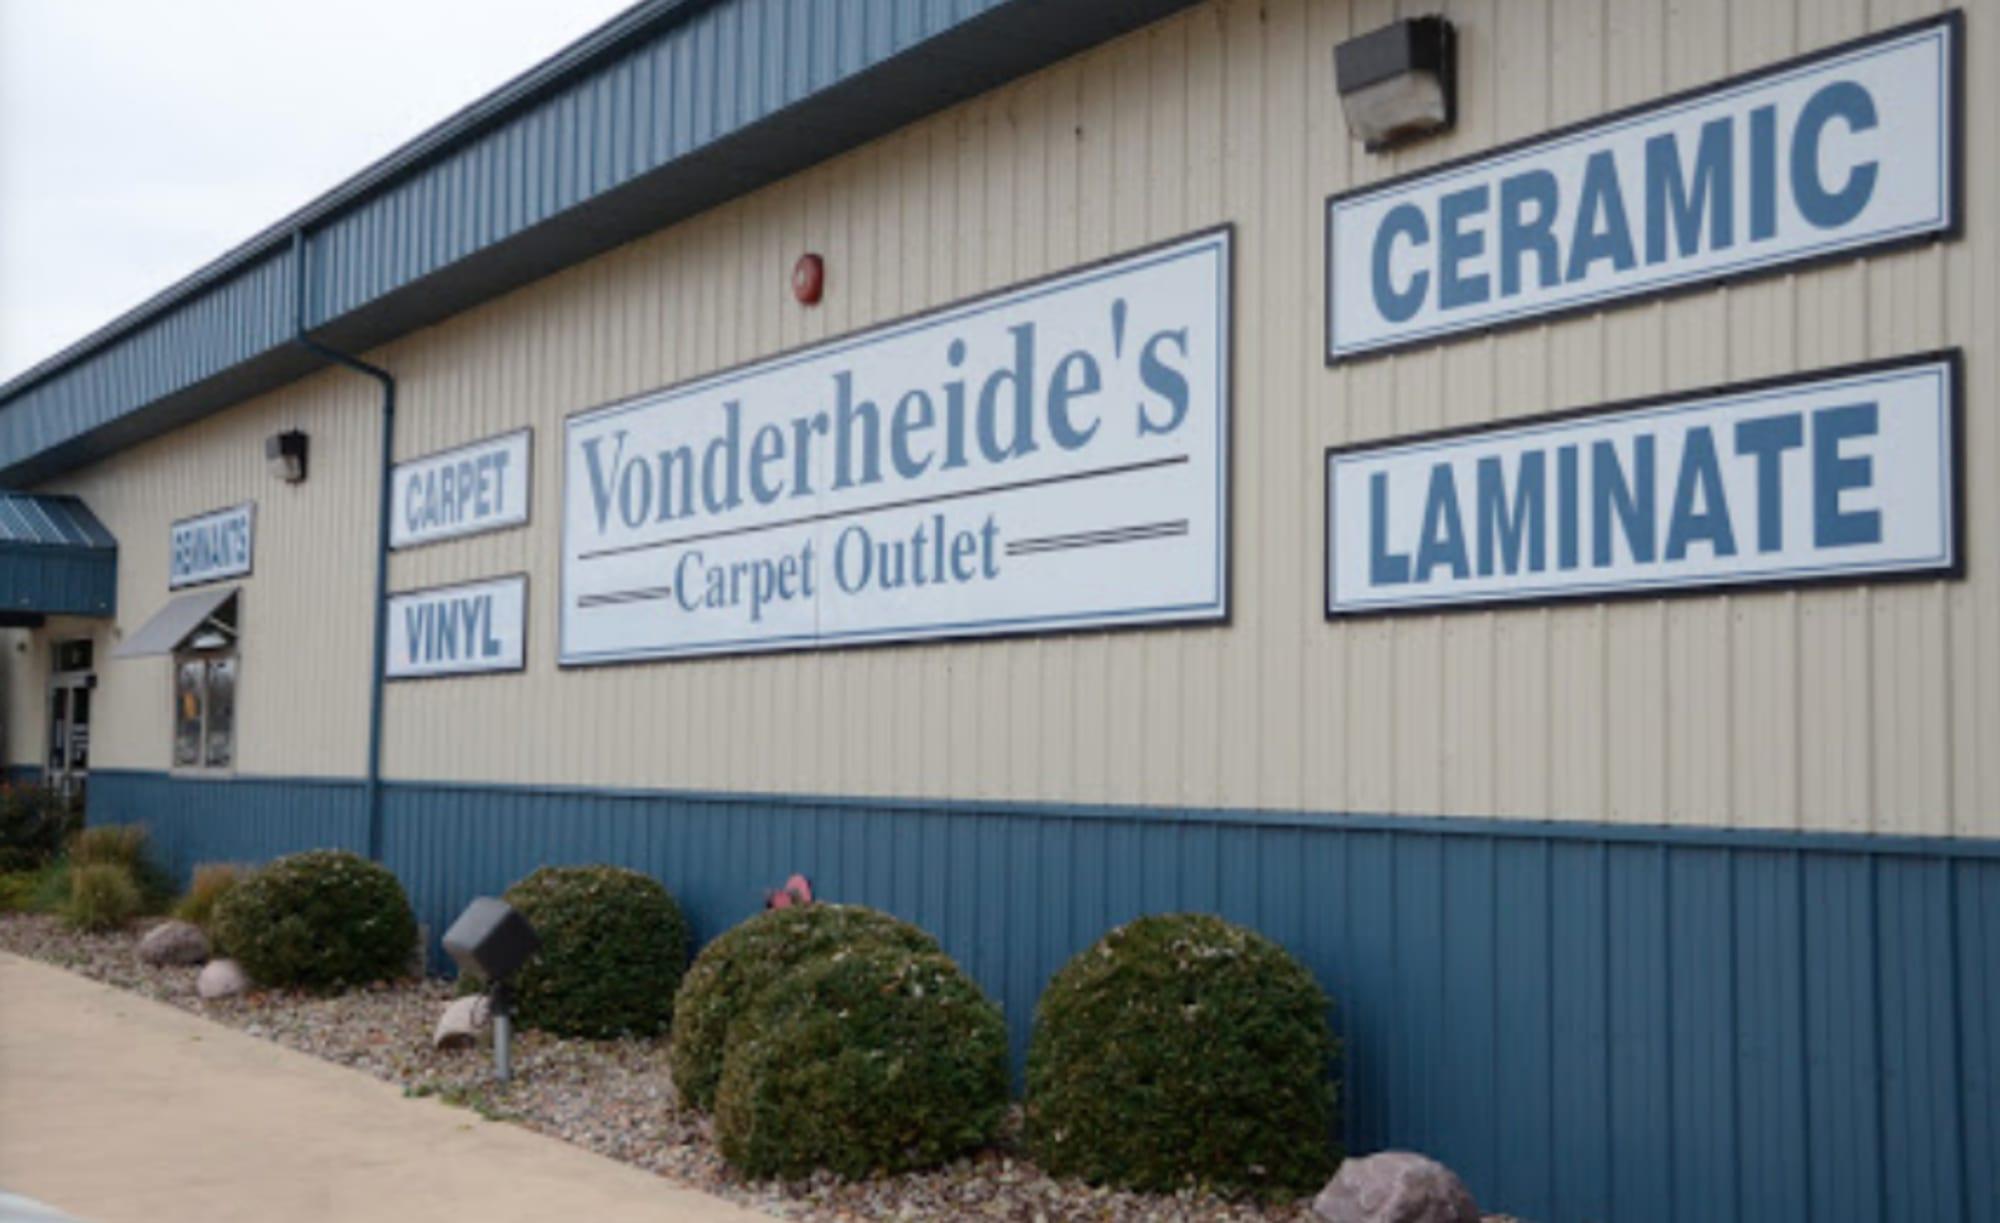 Vonderheide Floor Coverings Company - 105 N 14th St Pekin, IL 61554